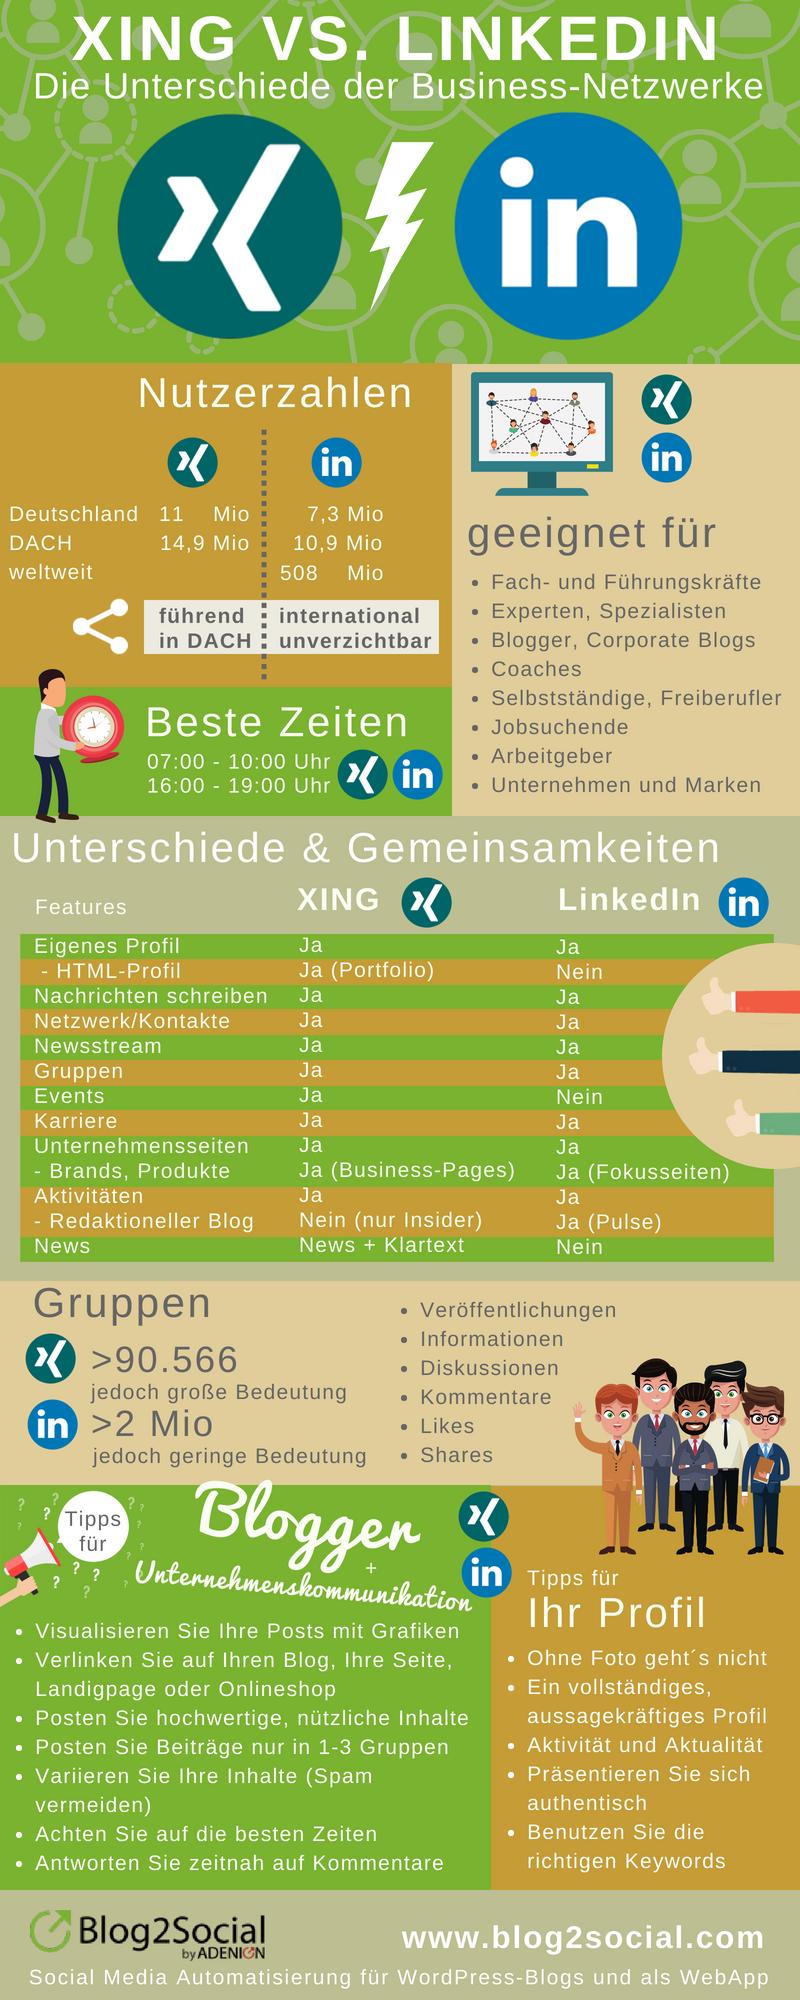 Xing Vs Linkedin Infografik Berufliche Weiterbildung Job Finden Soziale Medien